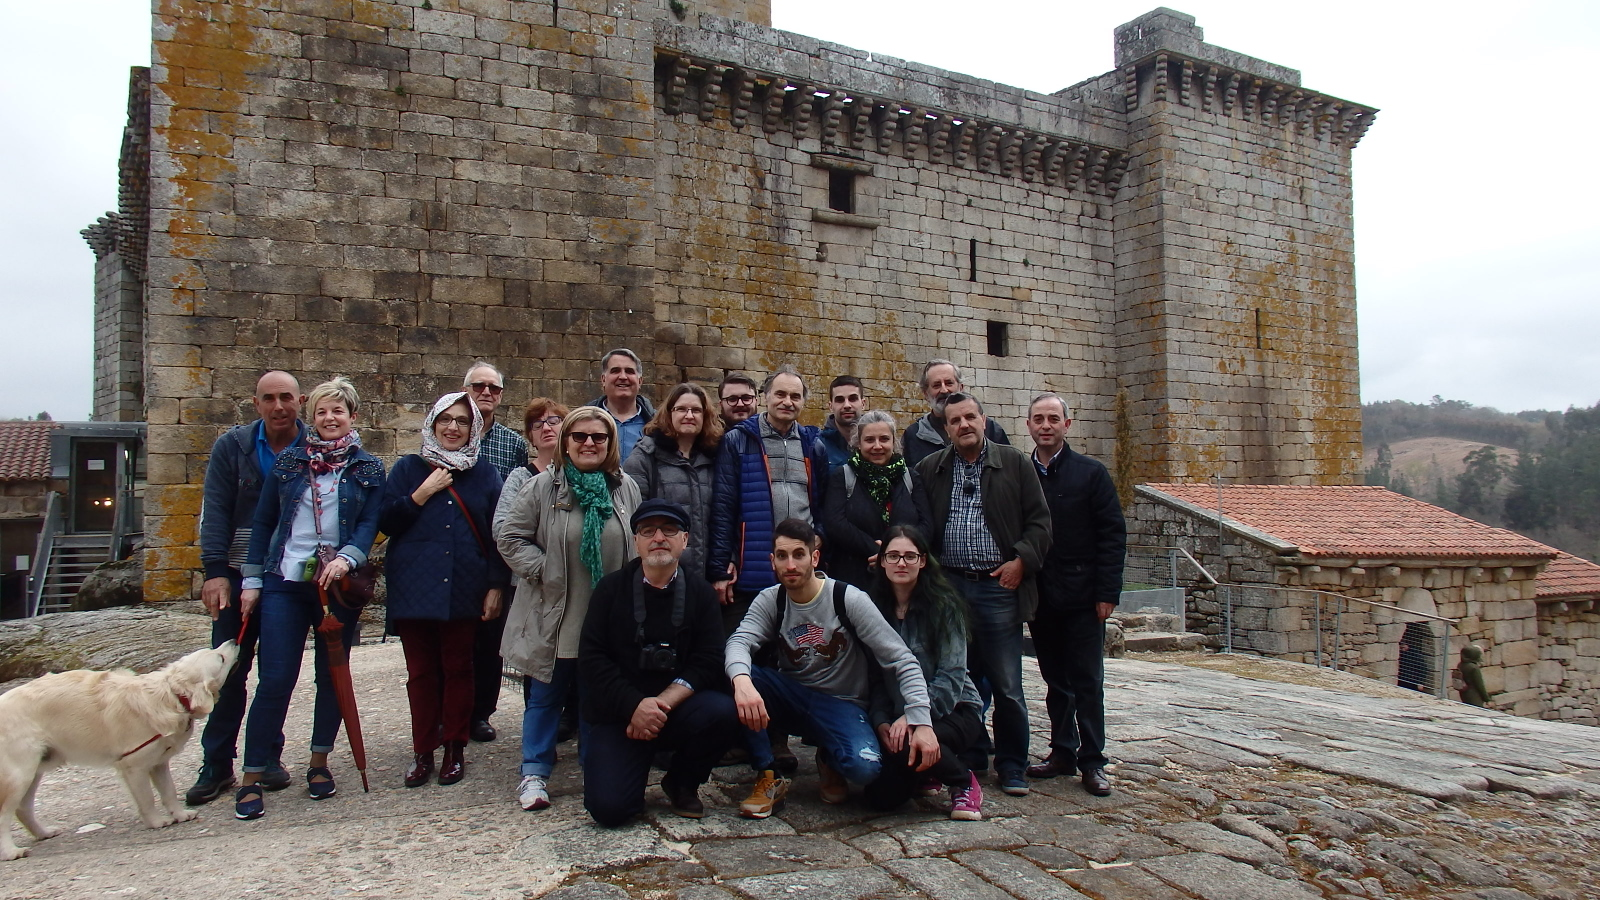 Visita guiada ao castelo de Pambre de A Colectiva, Instituto de Estudos Ulloáns